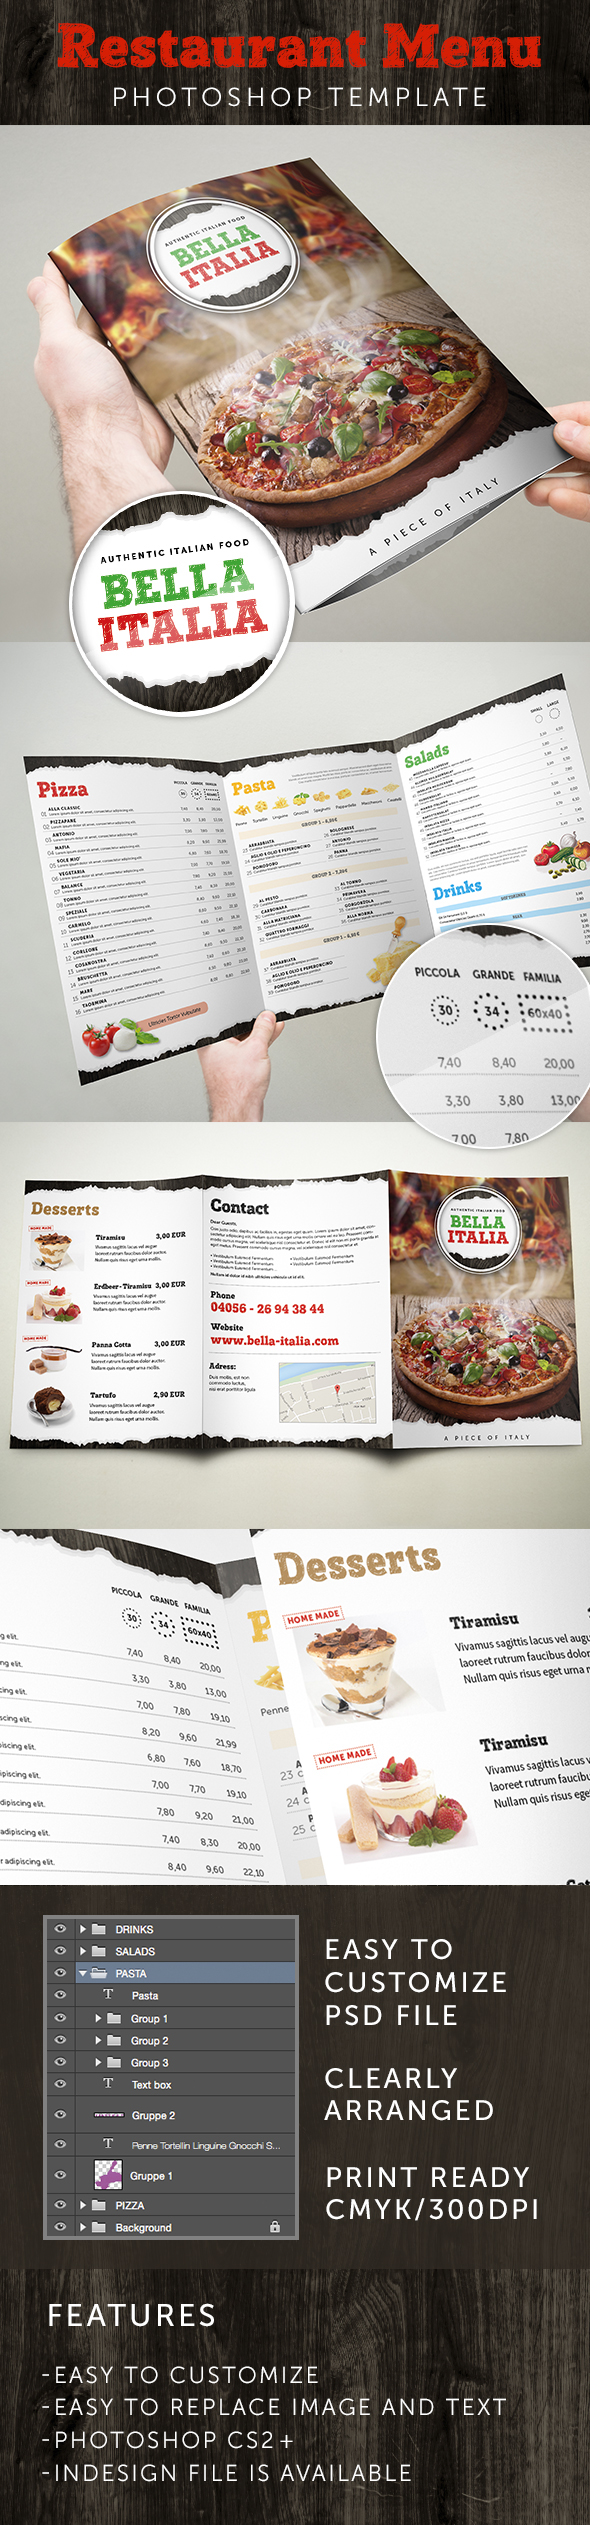 Restaurant Menu Template for InDesign & Photoshop on Behance